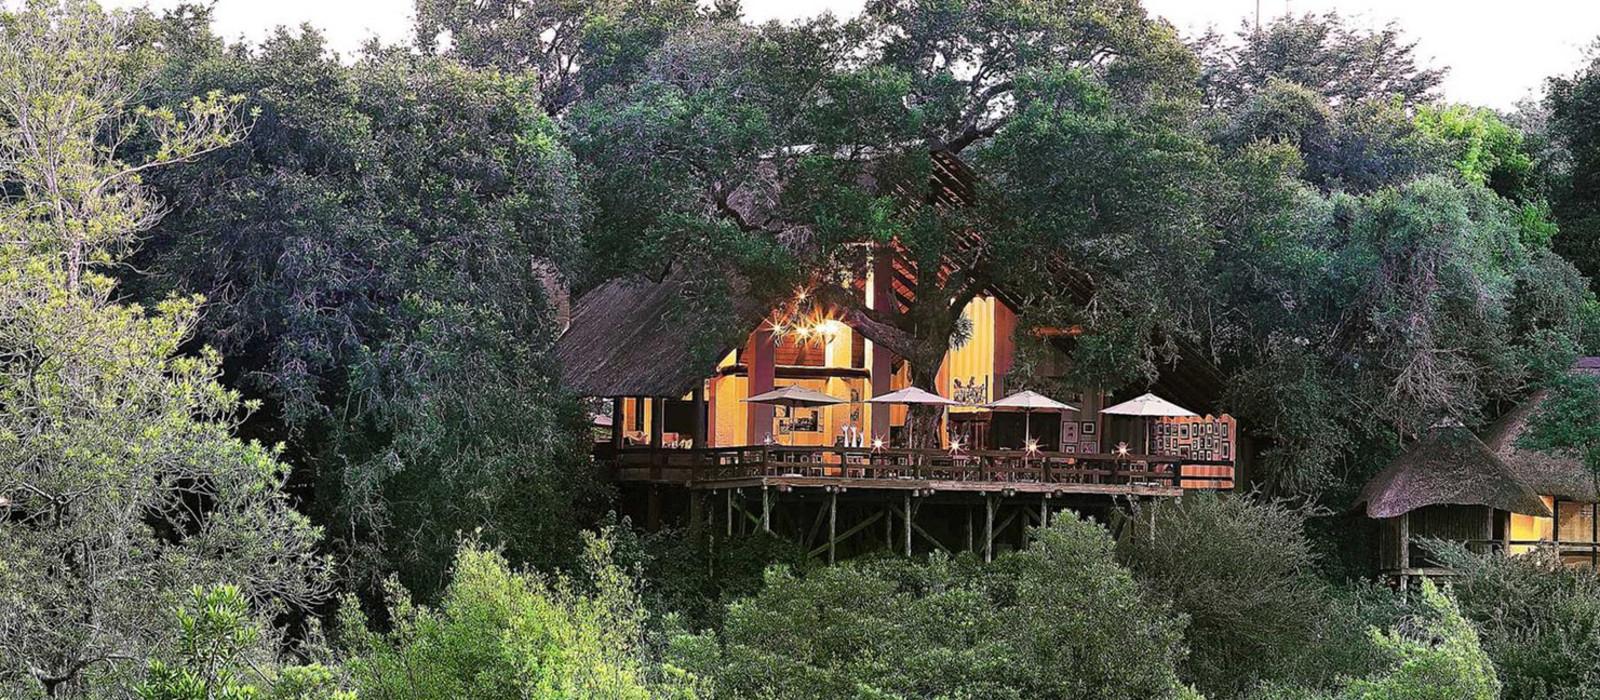 Hotel Londolozi Varty Camp South Africa